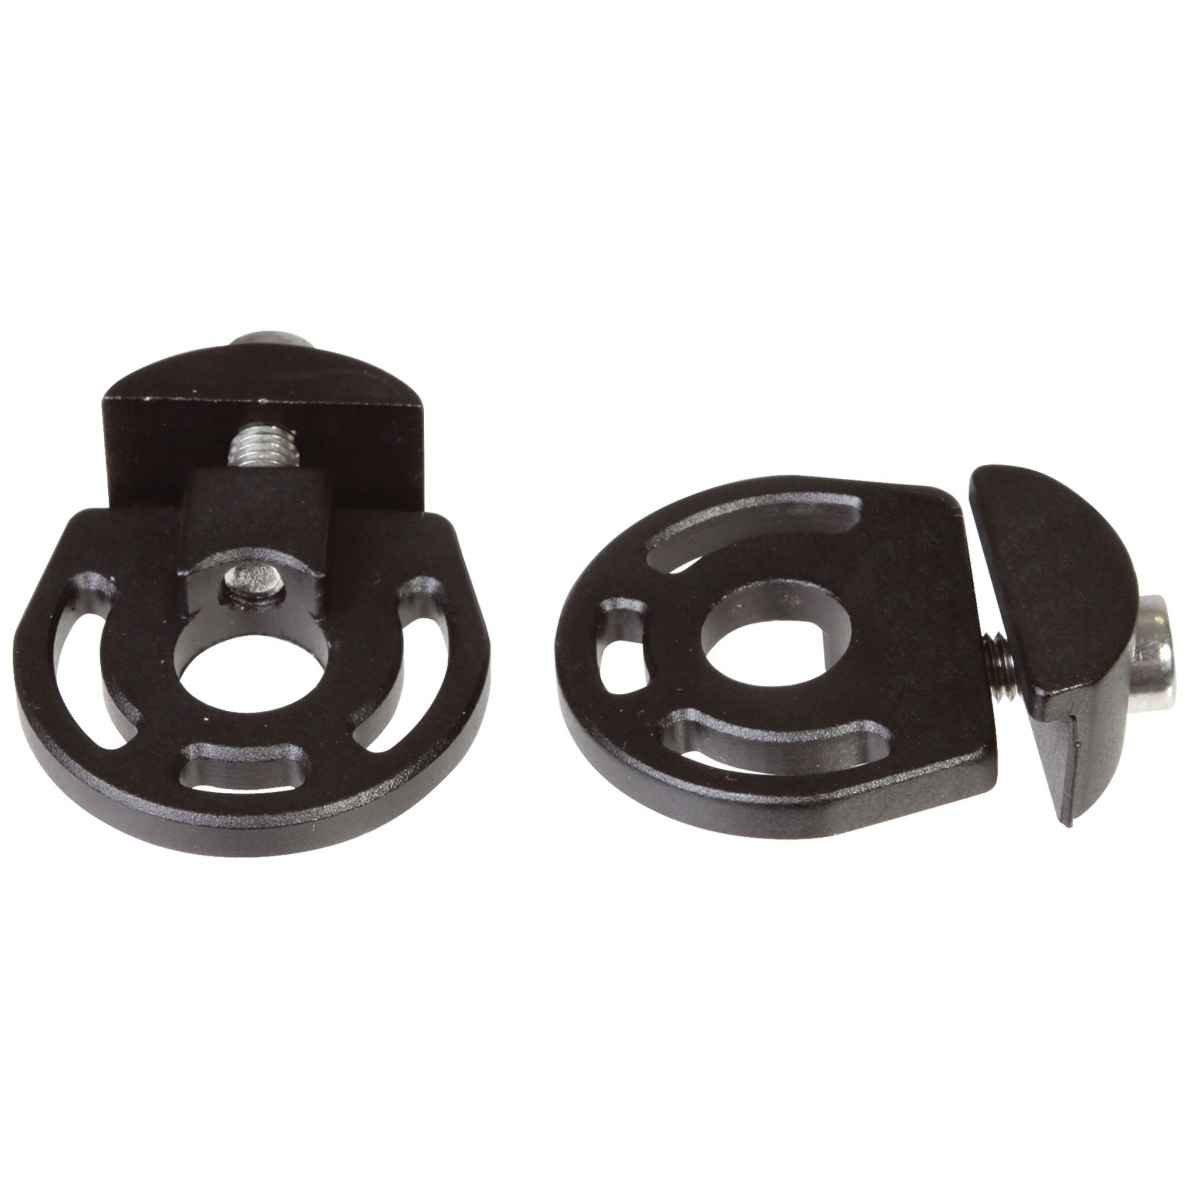 Gusset 2-Tugs axle tensioner, 10mm - black pr